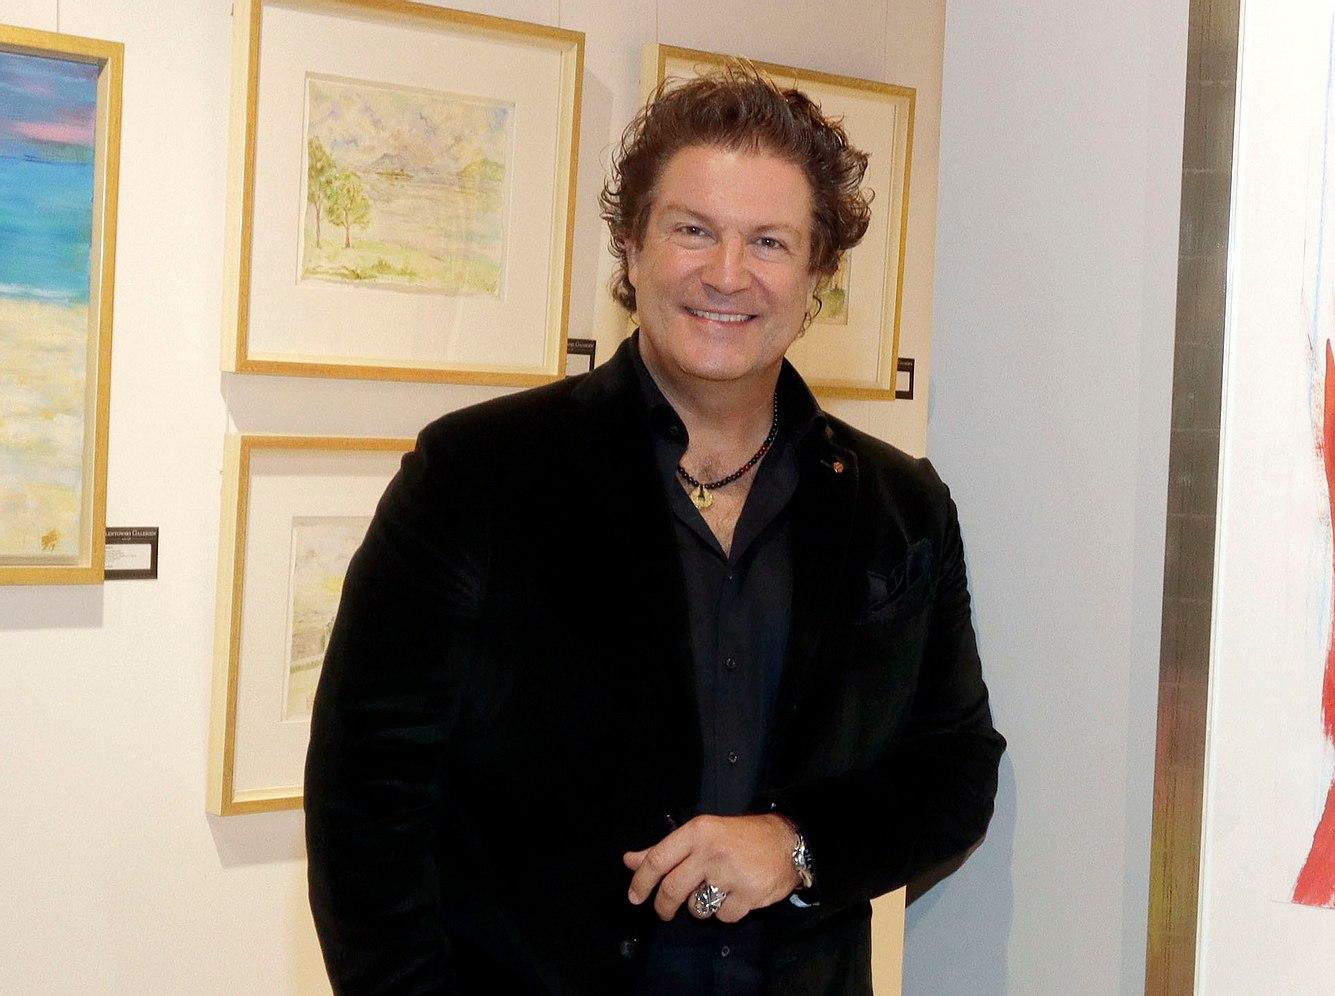 Schauspieler Francis Fulton-Smith 2019 in Hamburg.